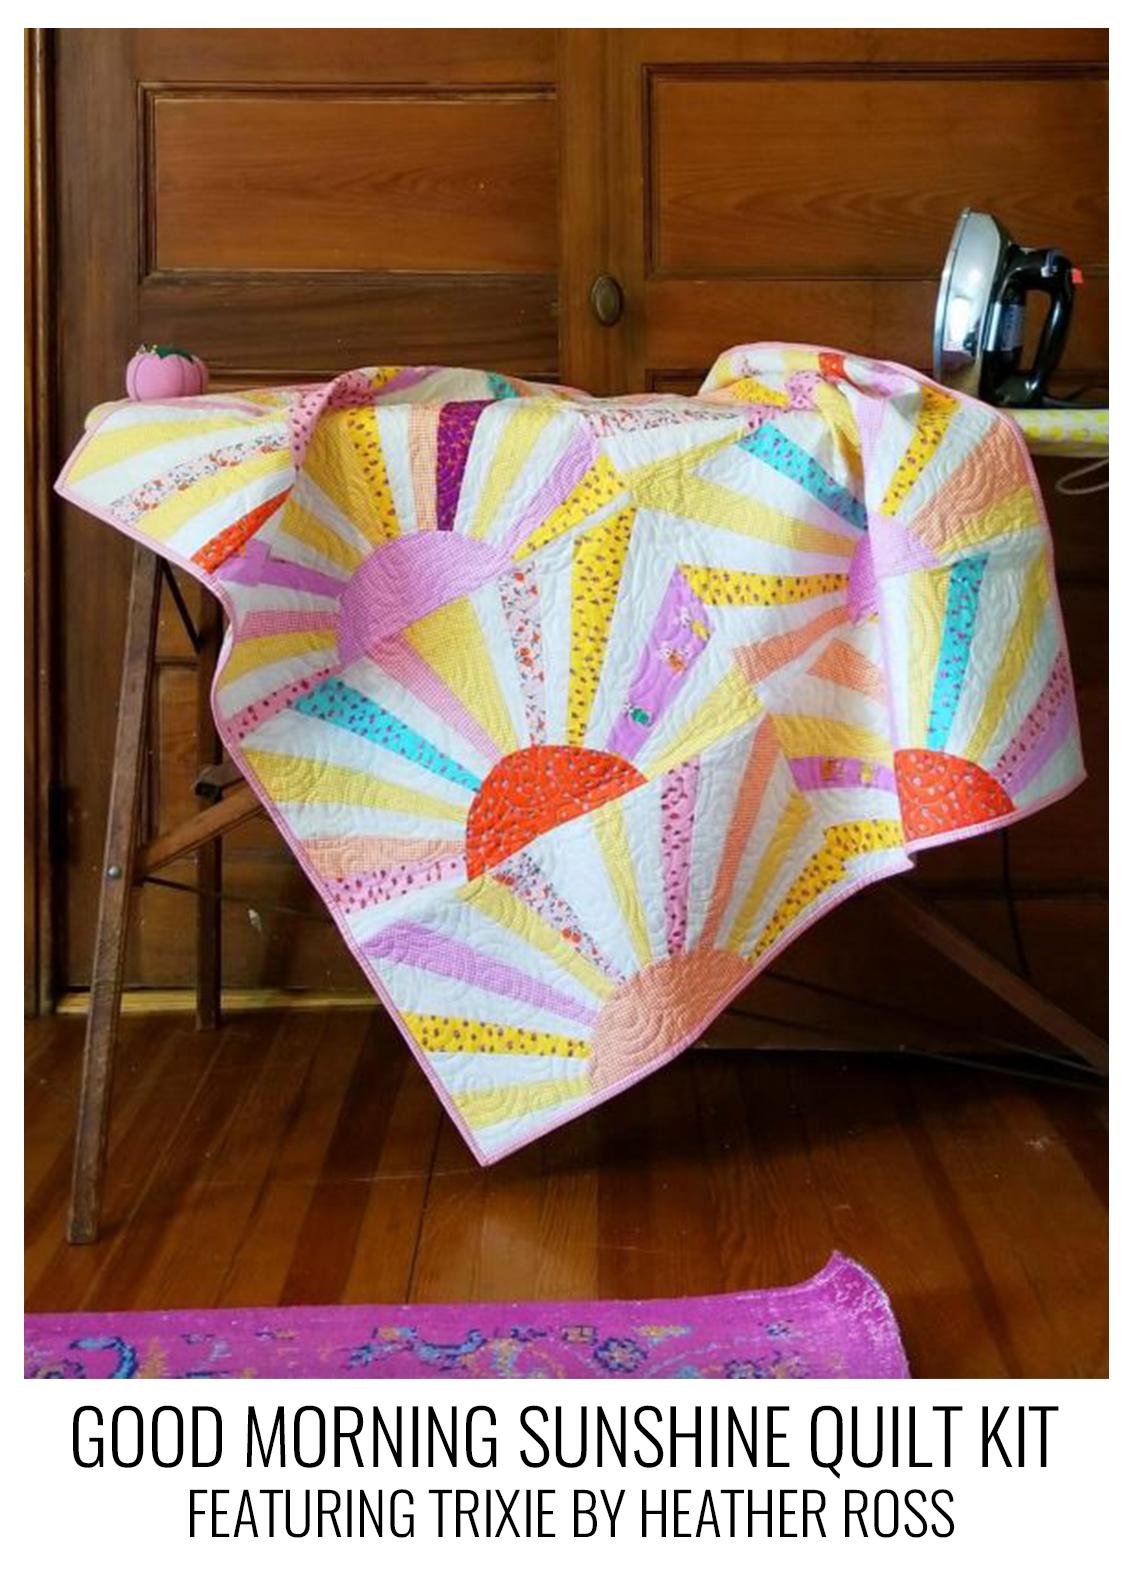 good morning sunshine- trixie quilt kit